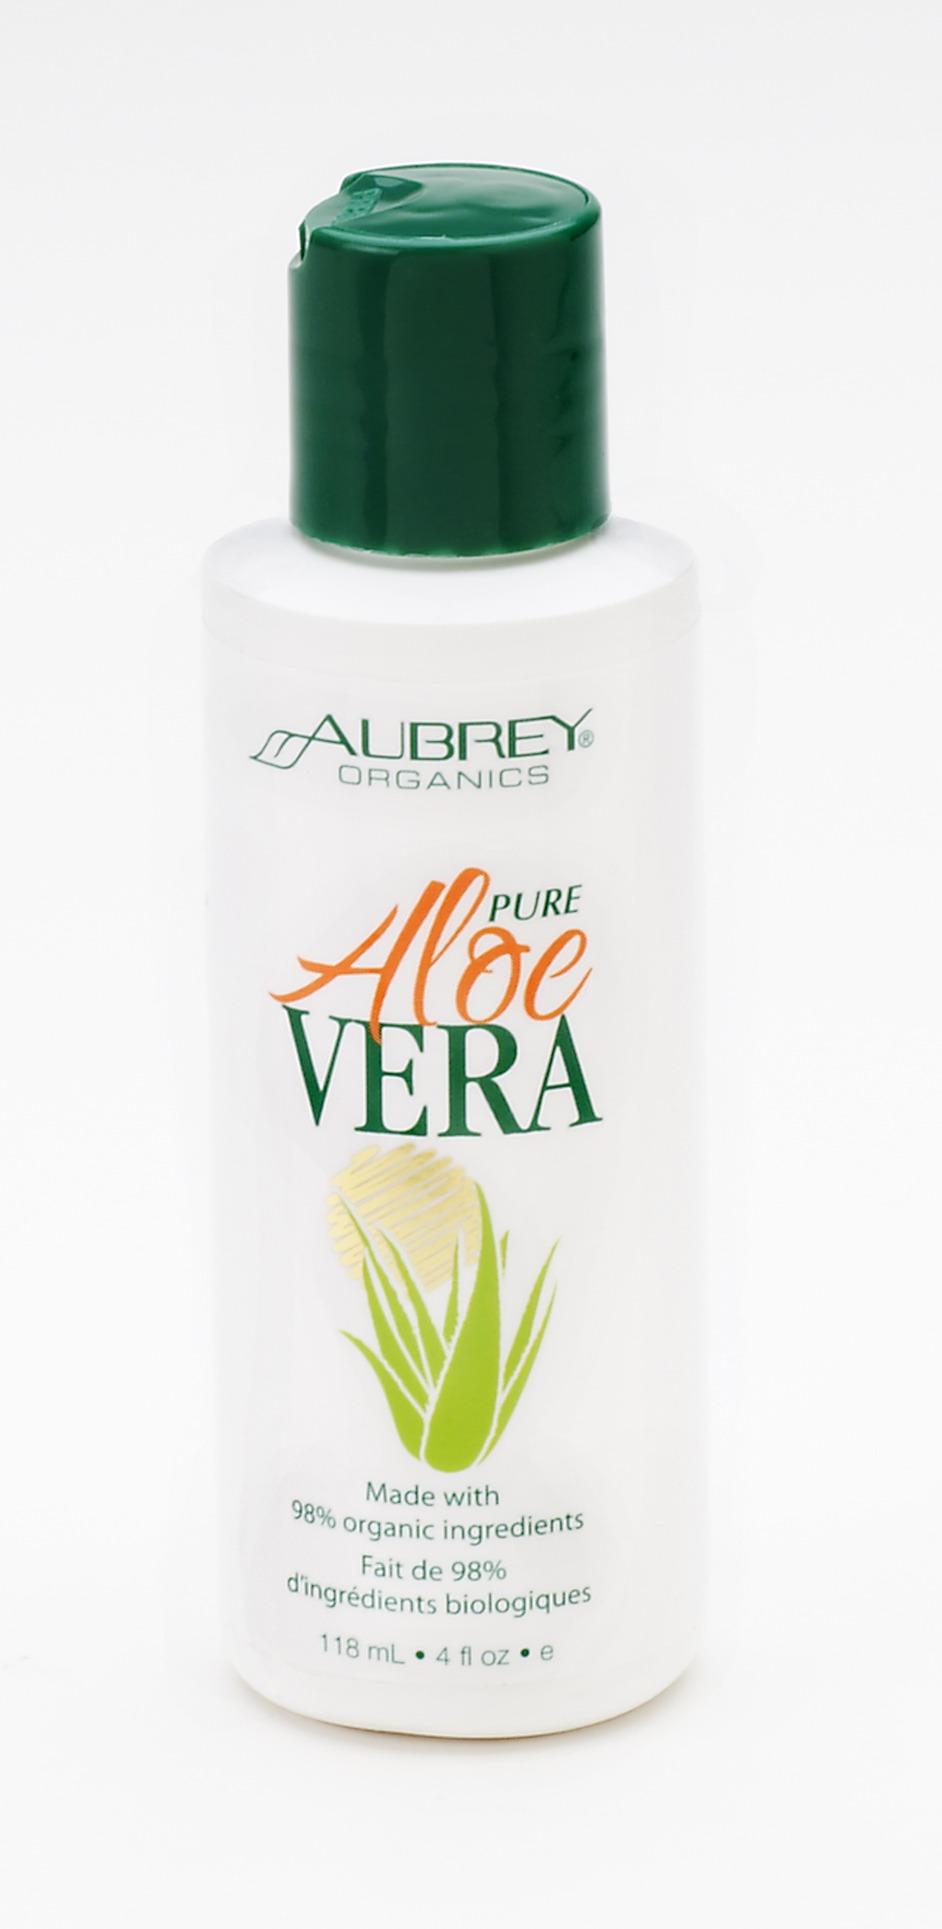 081 Aloe Vera